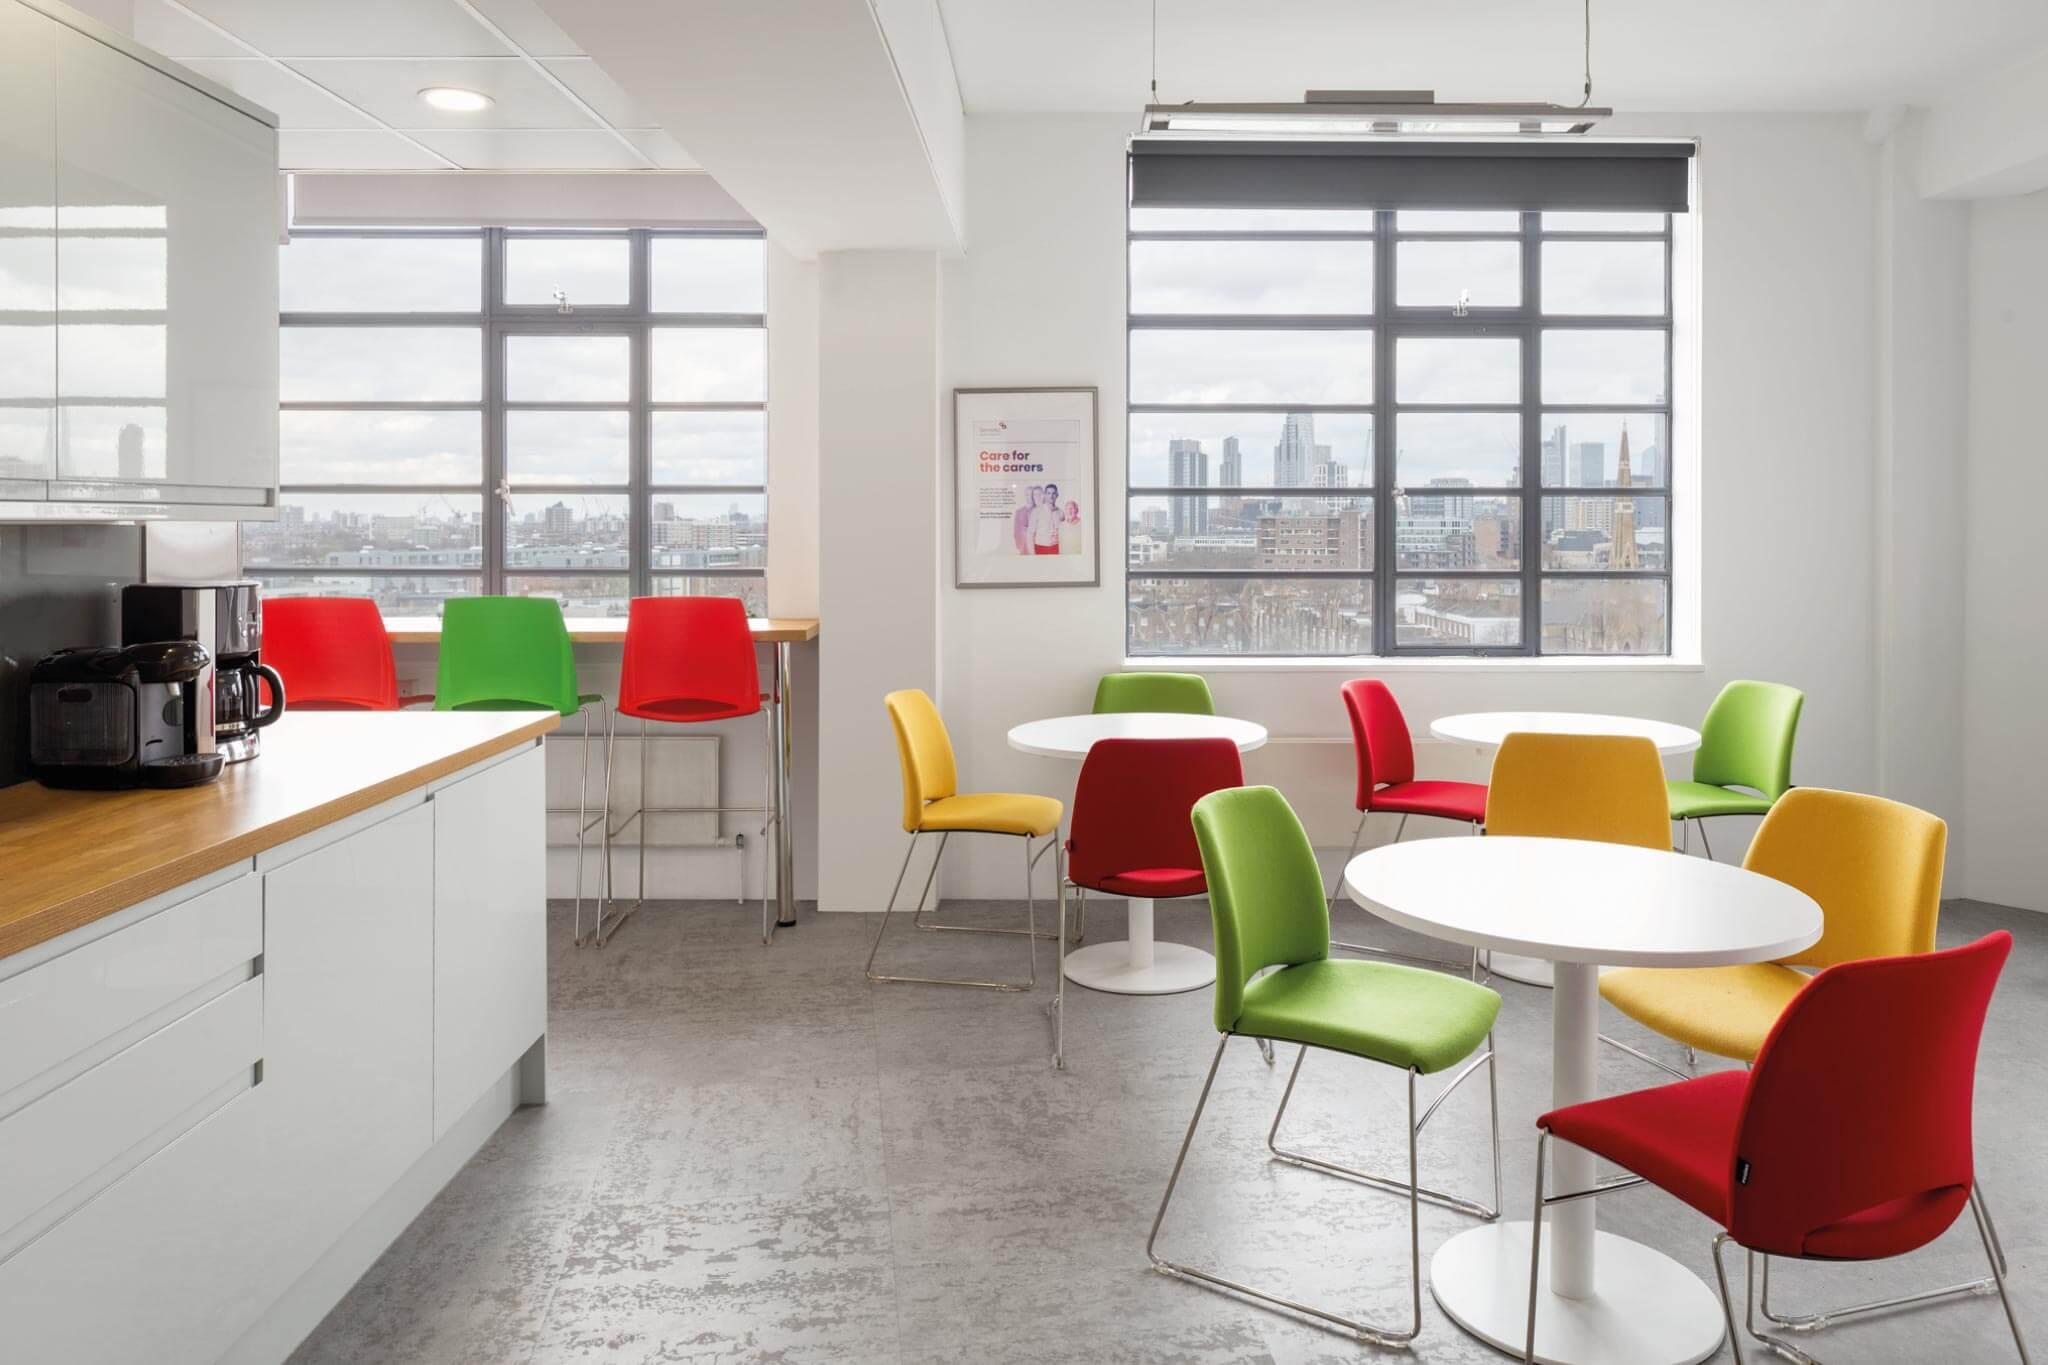 Servelec---London---Dale-Office-Interiors---Kitchen-2019